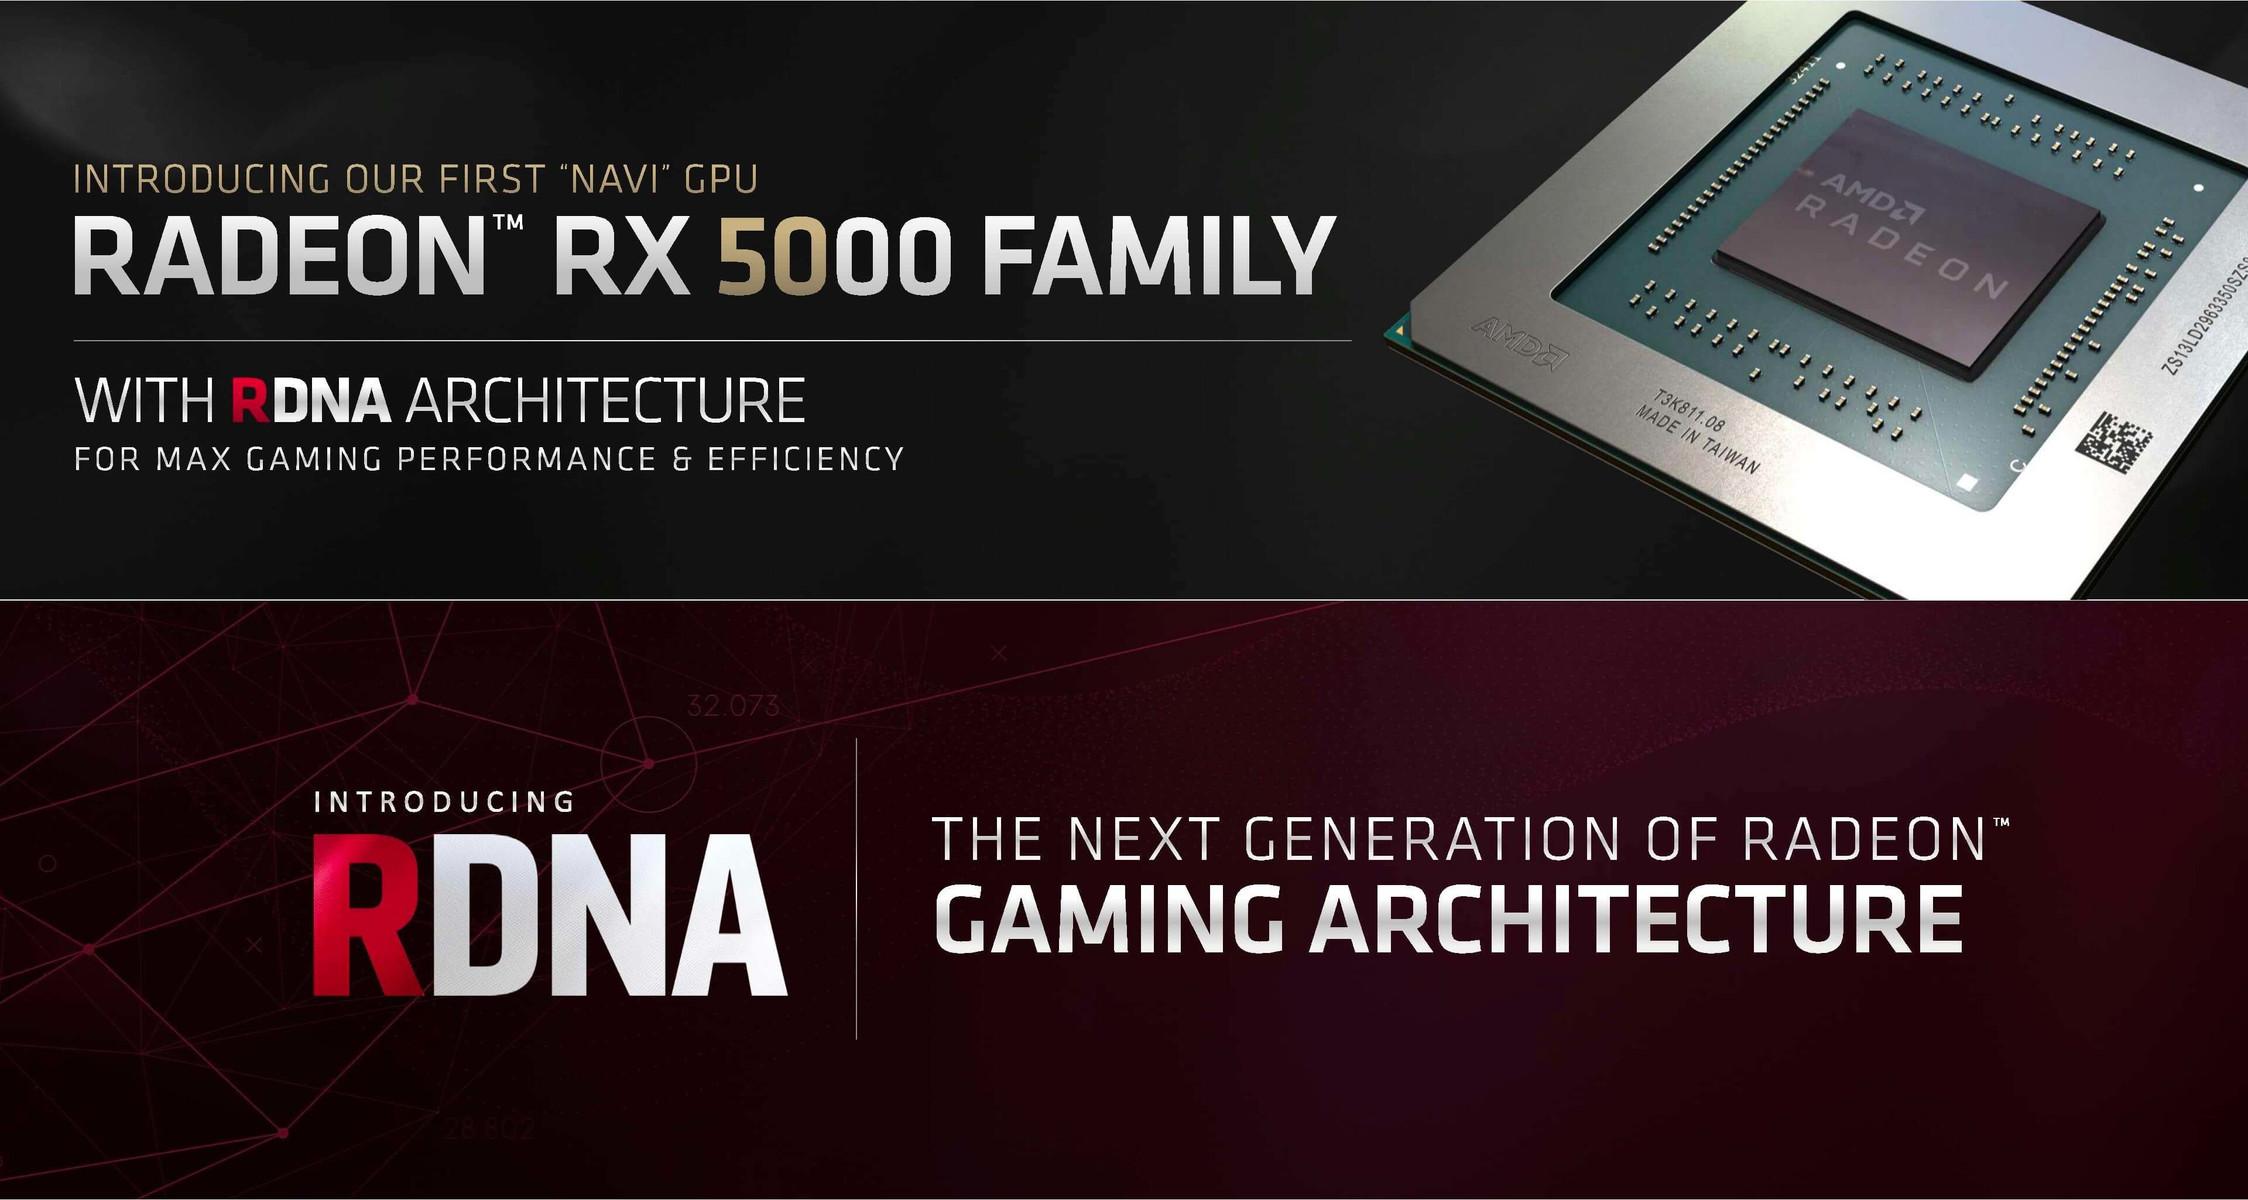 Rumor: AMD Navi a Stopgap, Hybrid Design of RDNA and